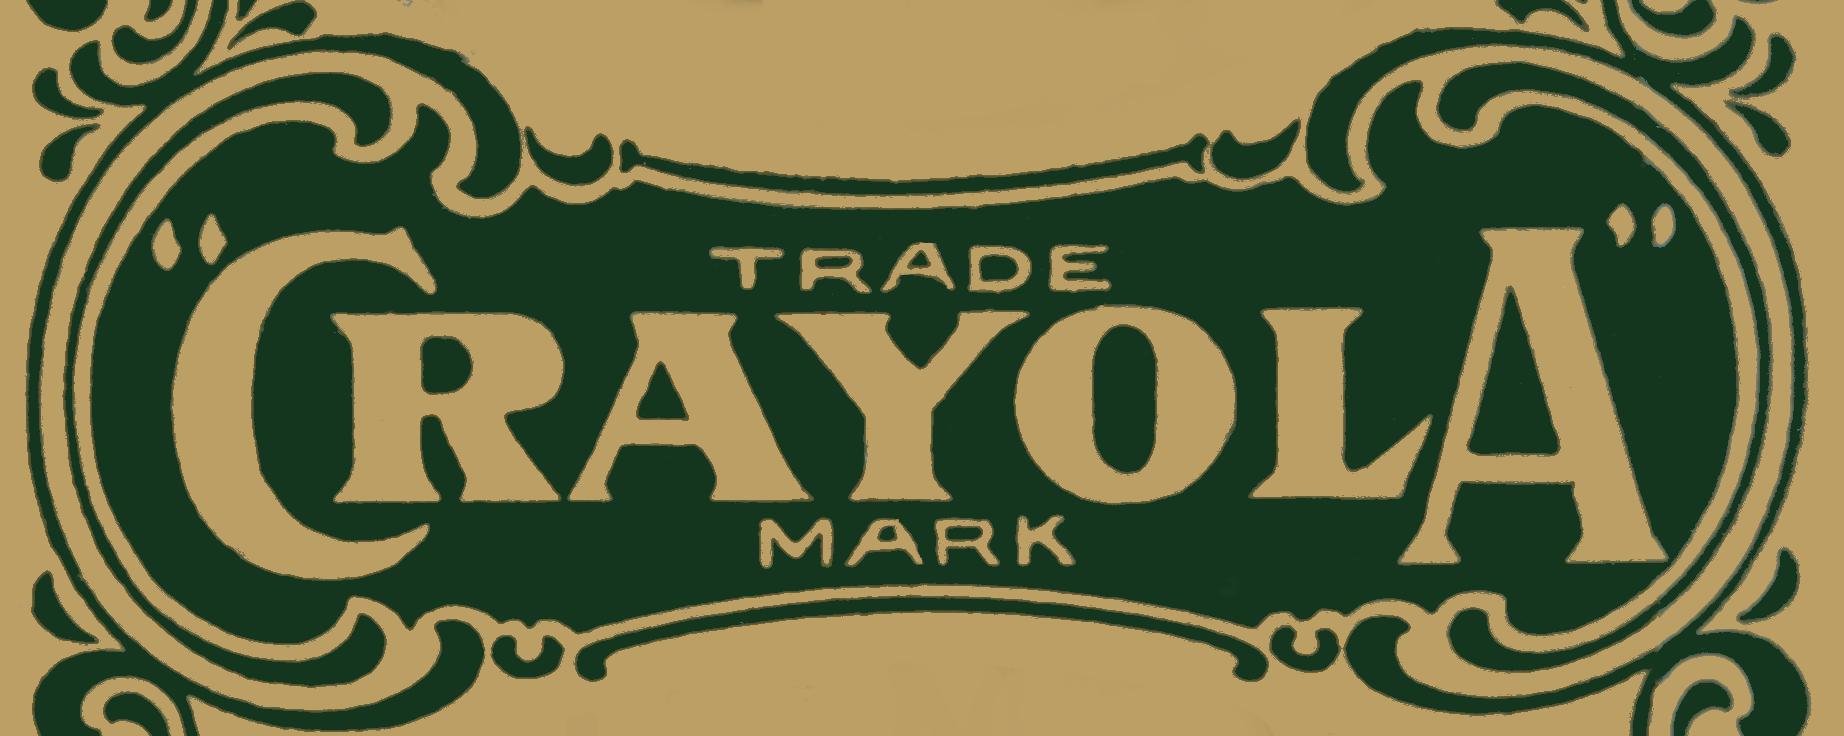 Crayola-1903-Logo